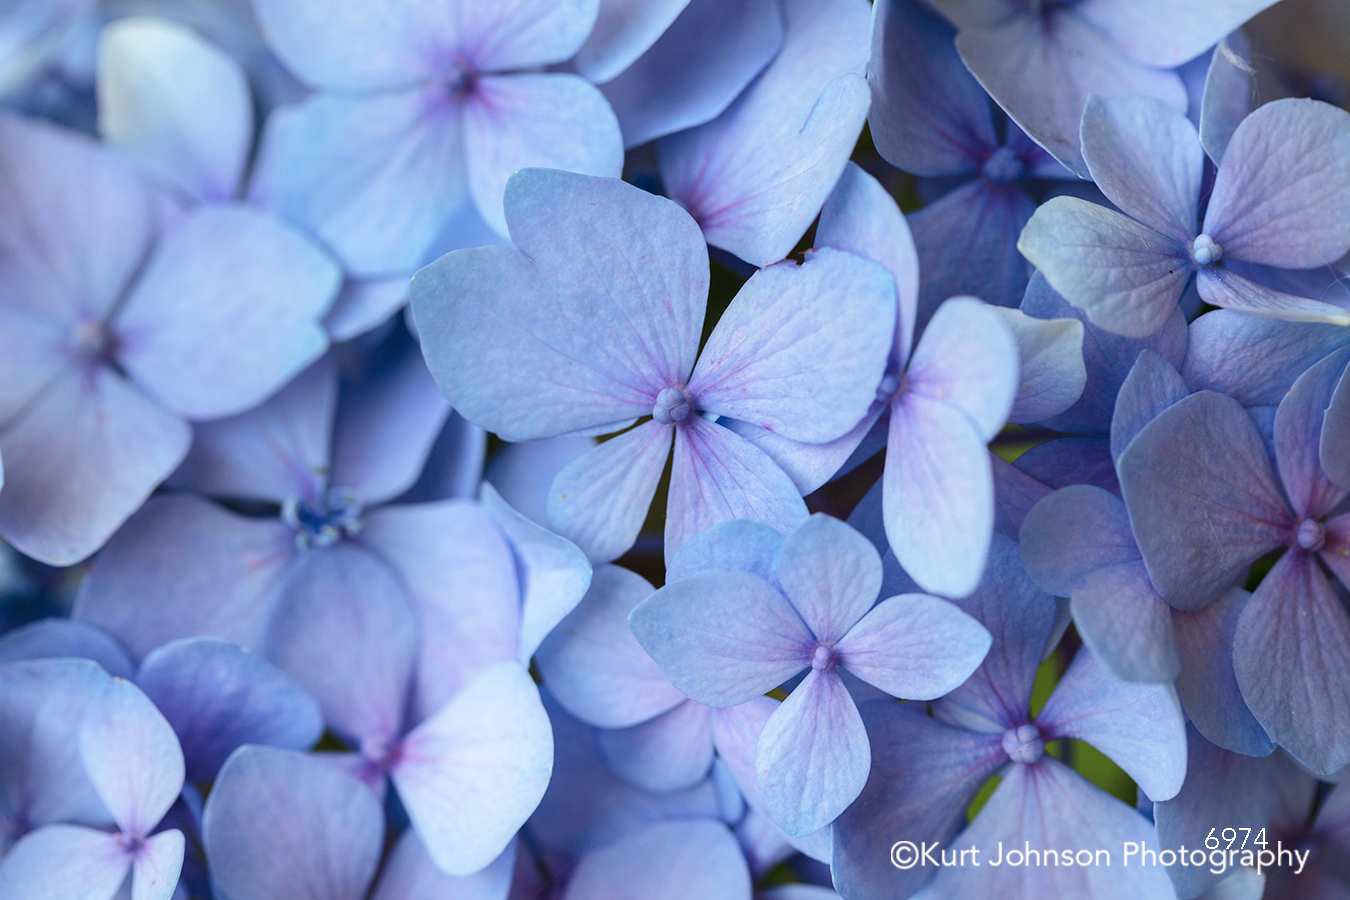 blue lavender purple hydrangea flower flowers petal petals close up macro detail pattern